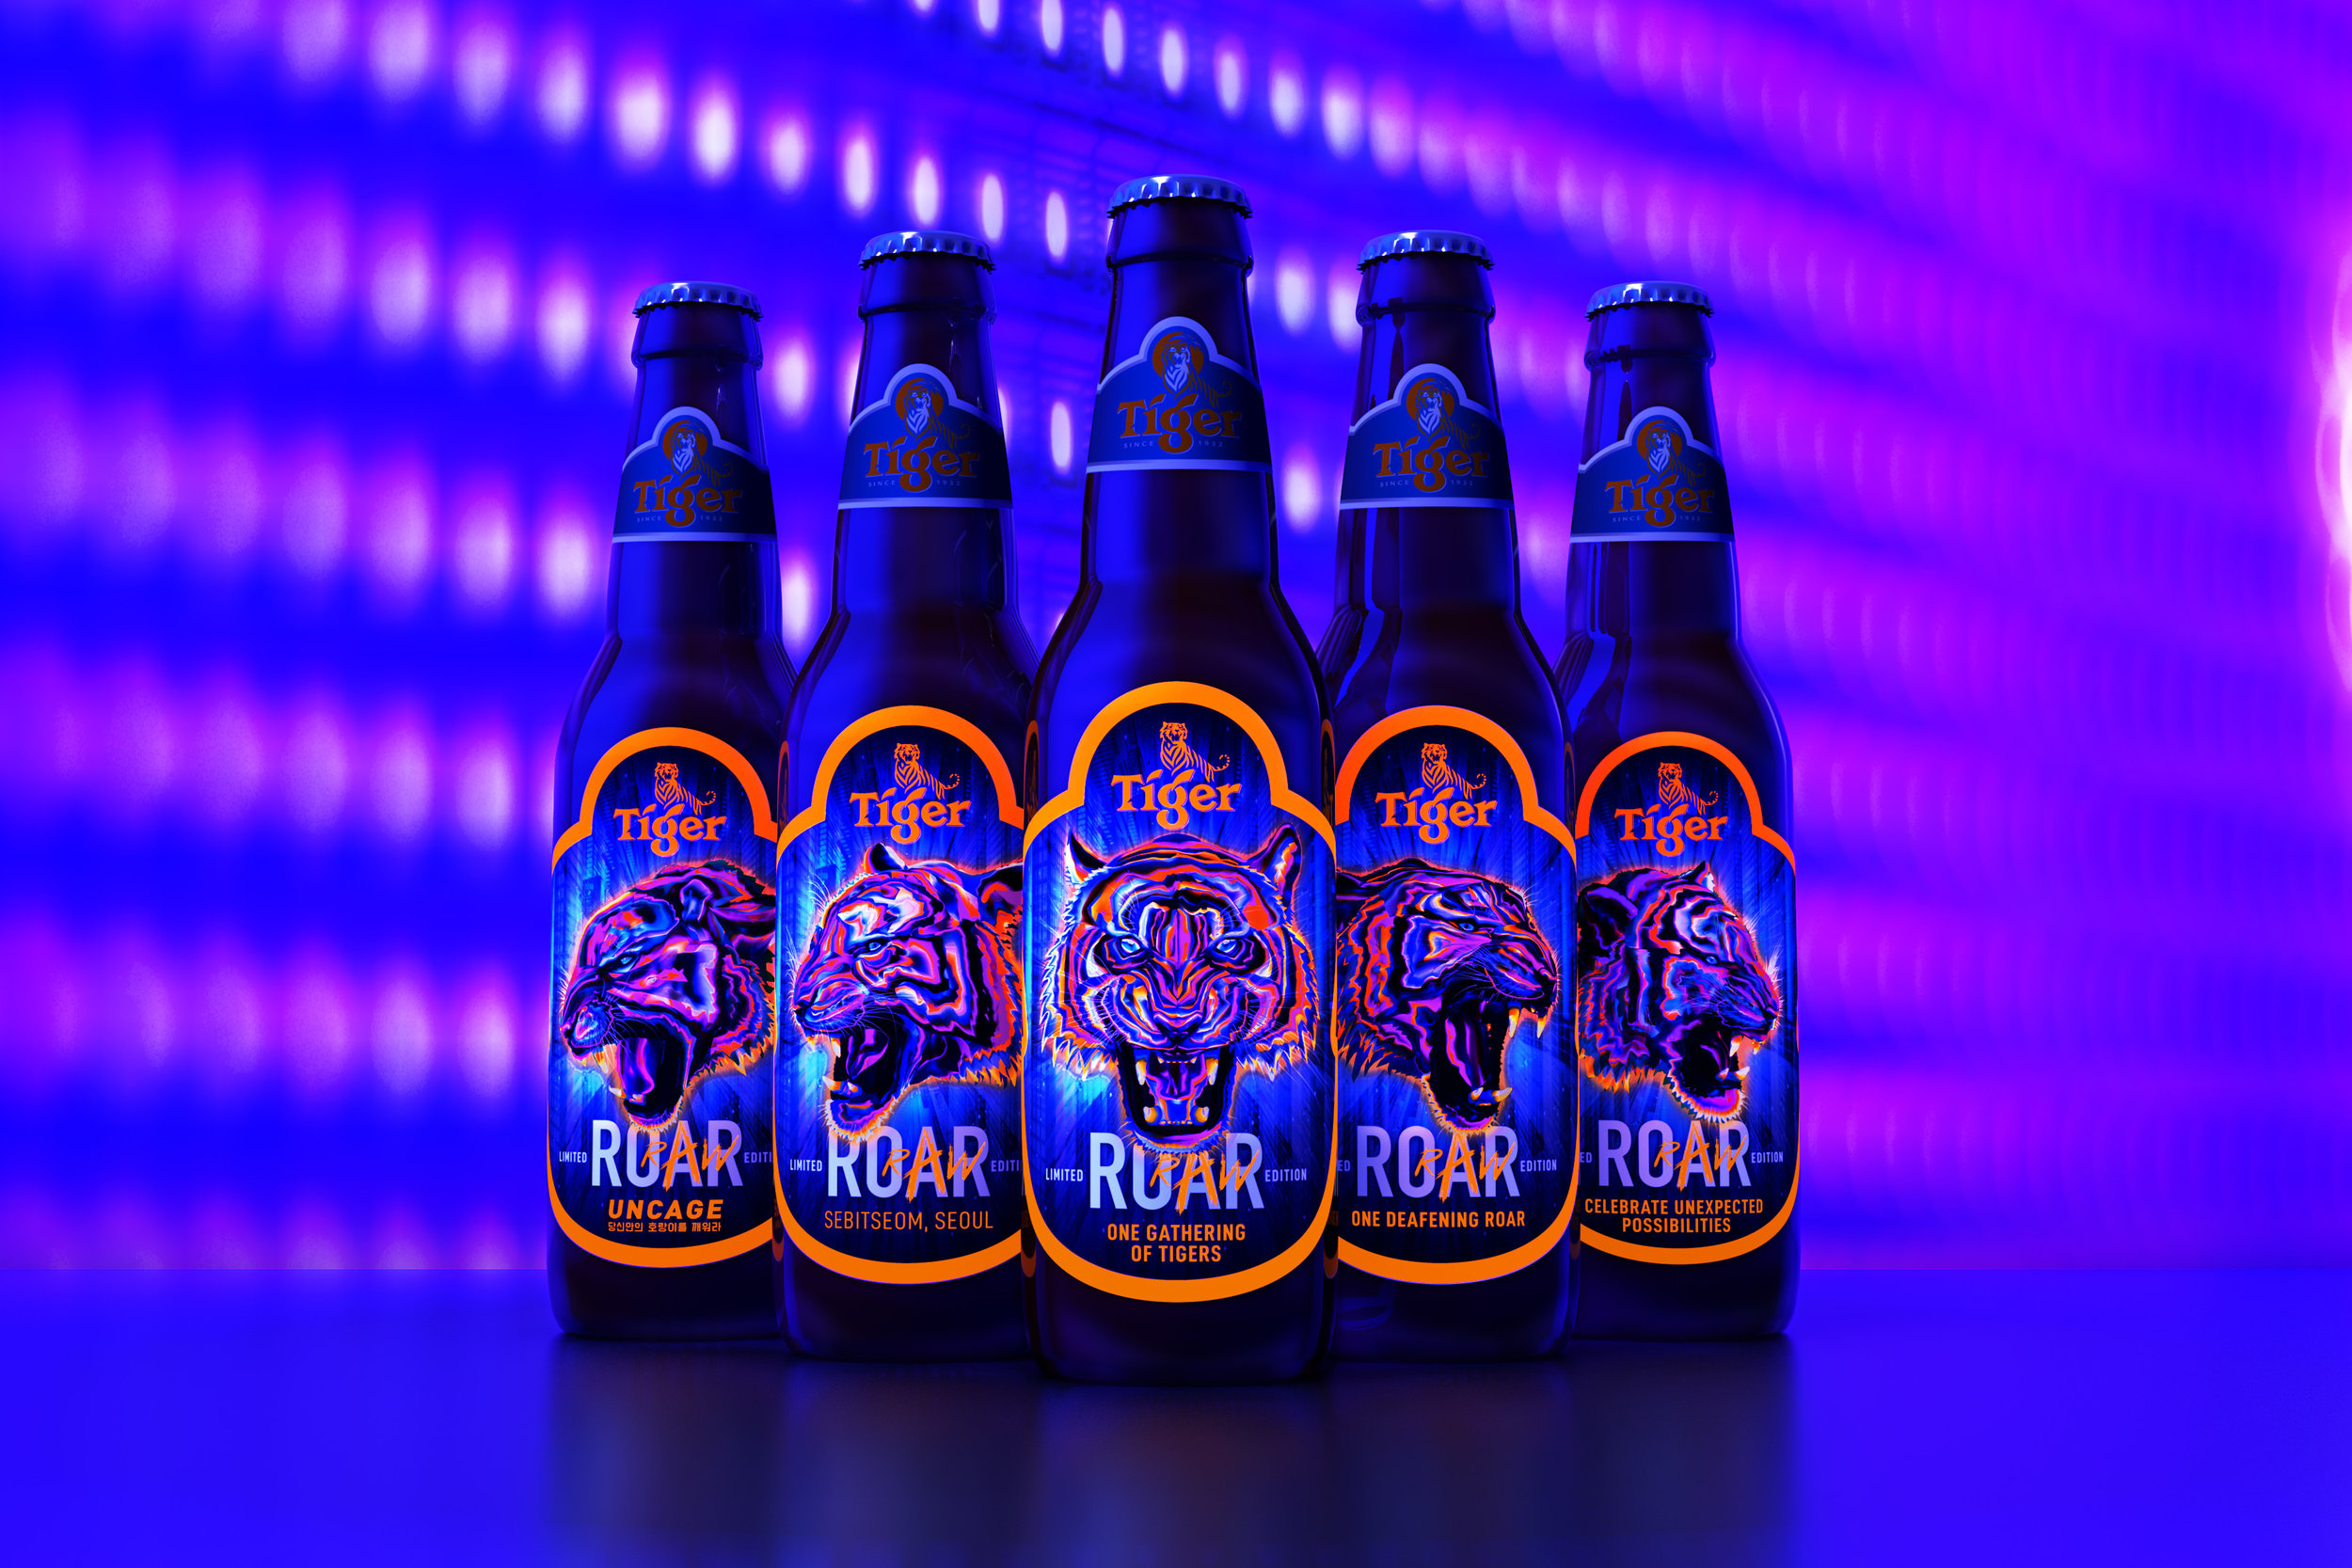 TigerRoar_001_220619.jpg